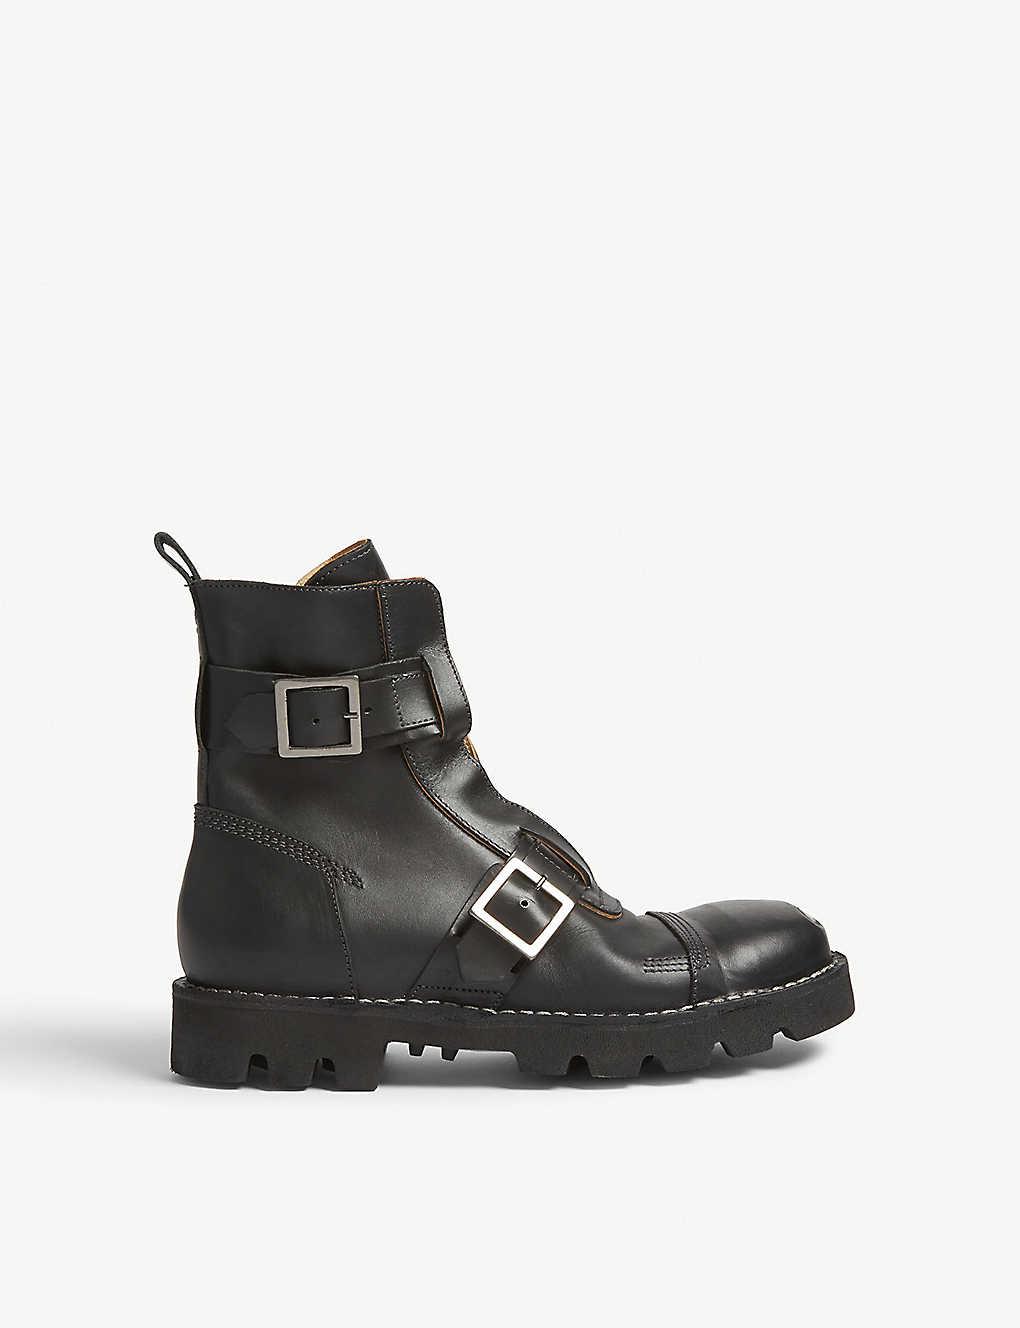 270116bf8bd DIESEL - Hardkor steel toe leather boots | Selfridges.com